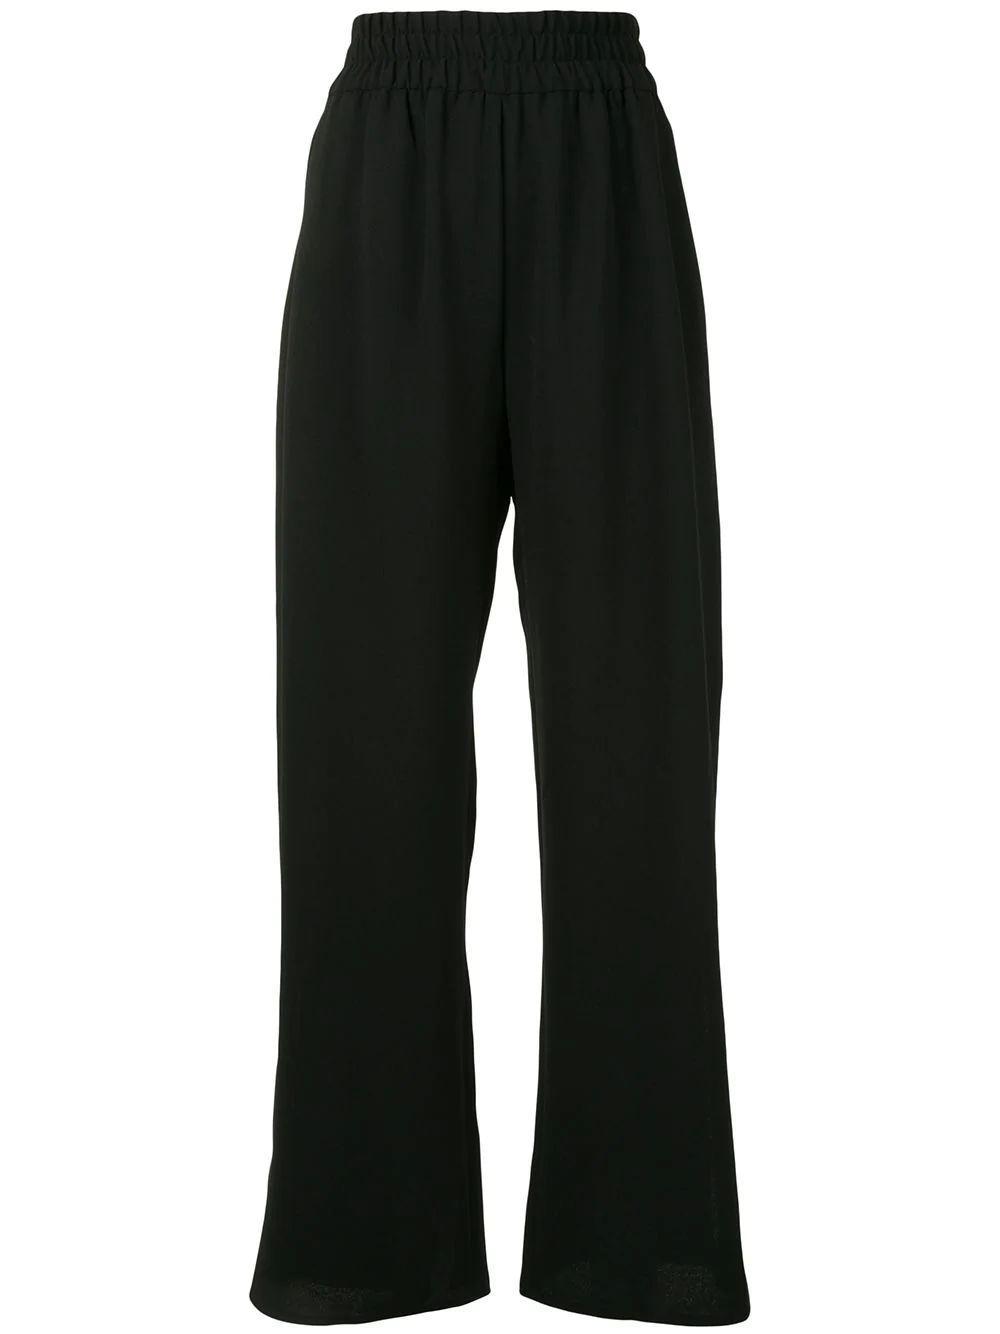 Poula Elastic Wide Leg Pant Item # 1039 10 150 4004